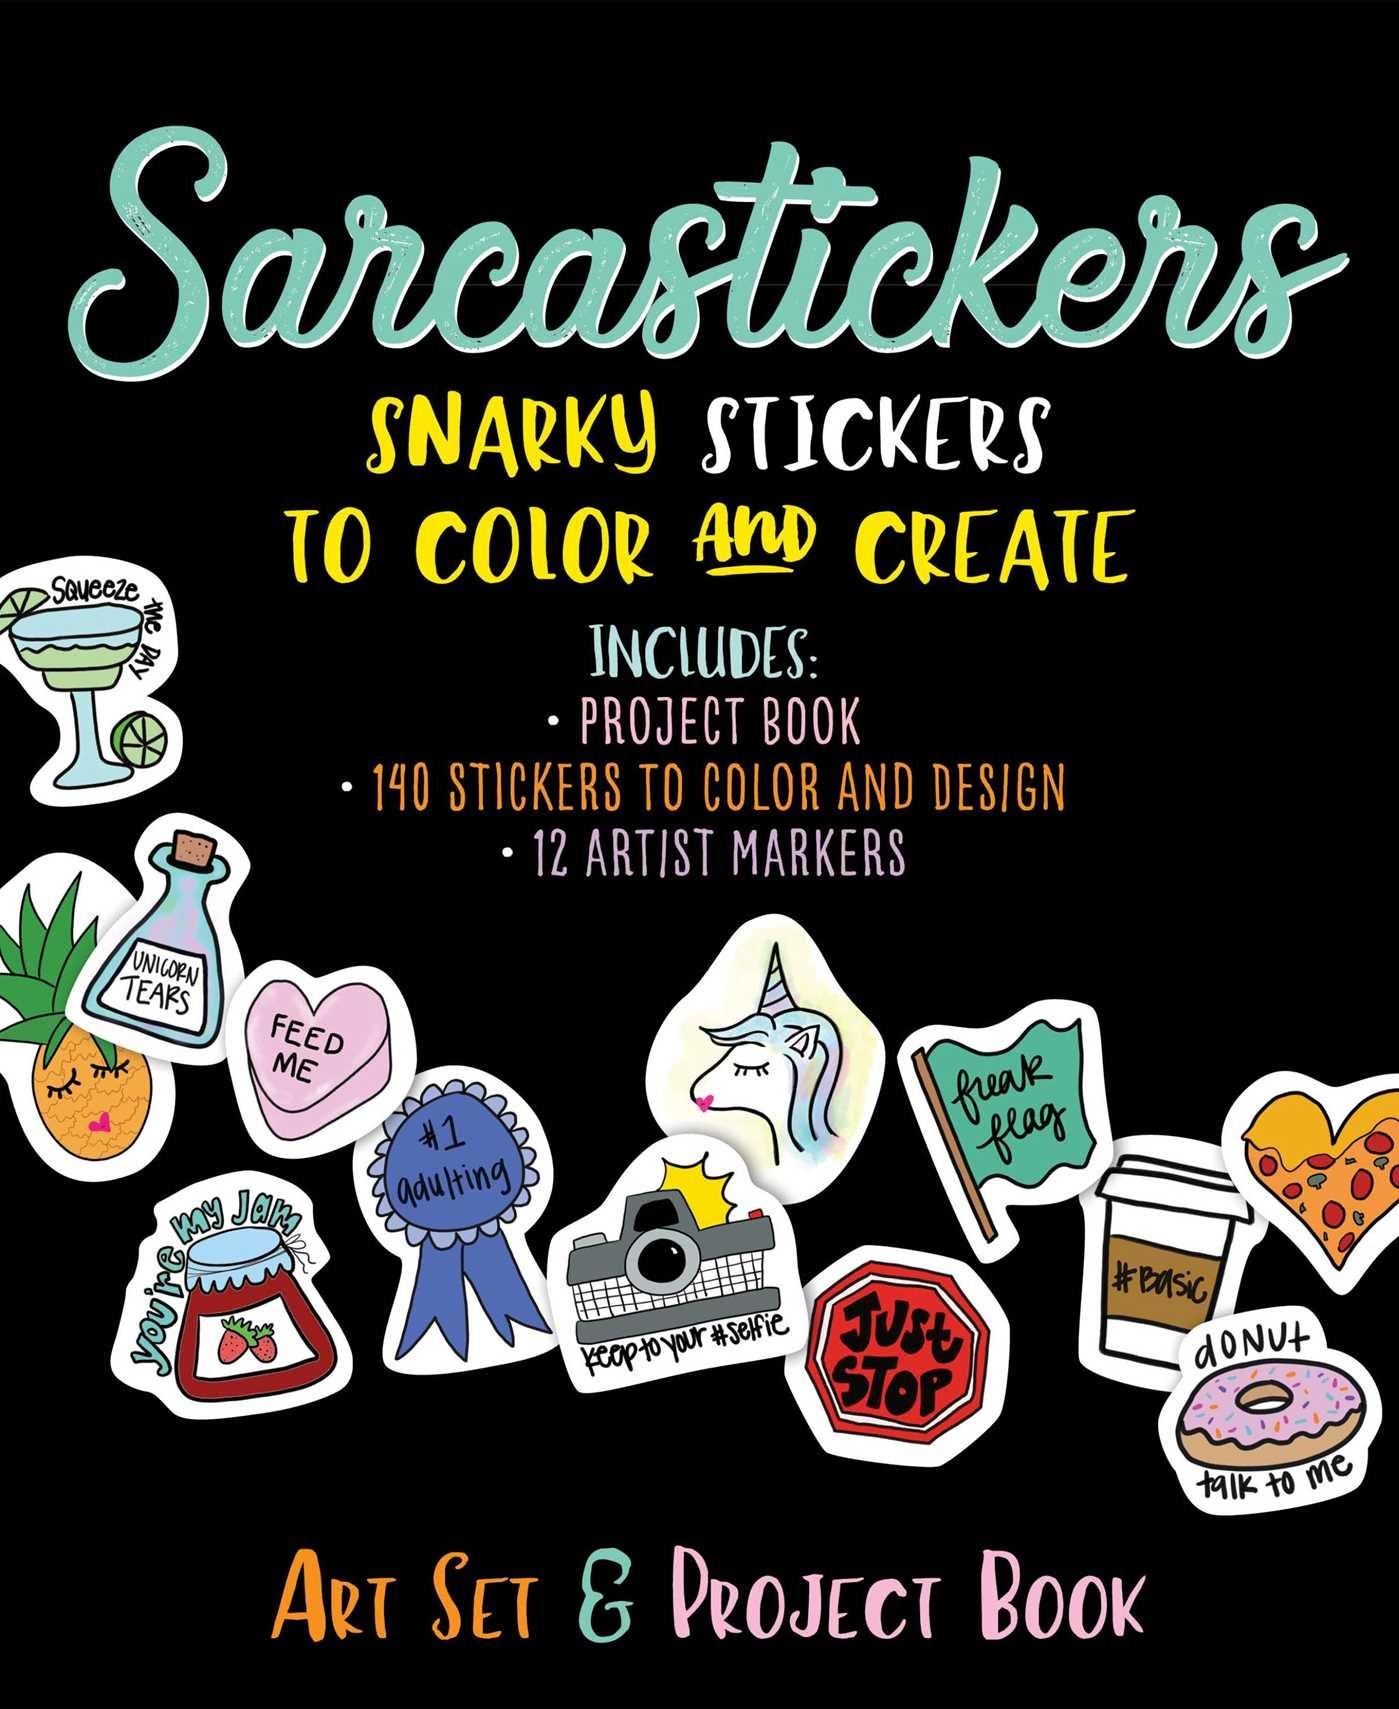 sarcastickers